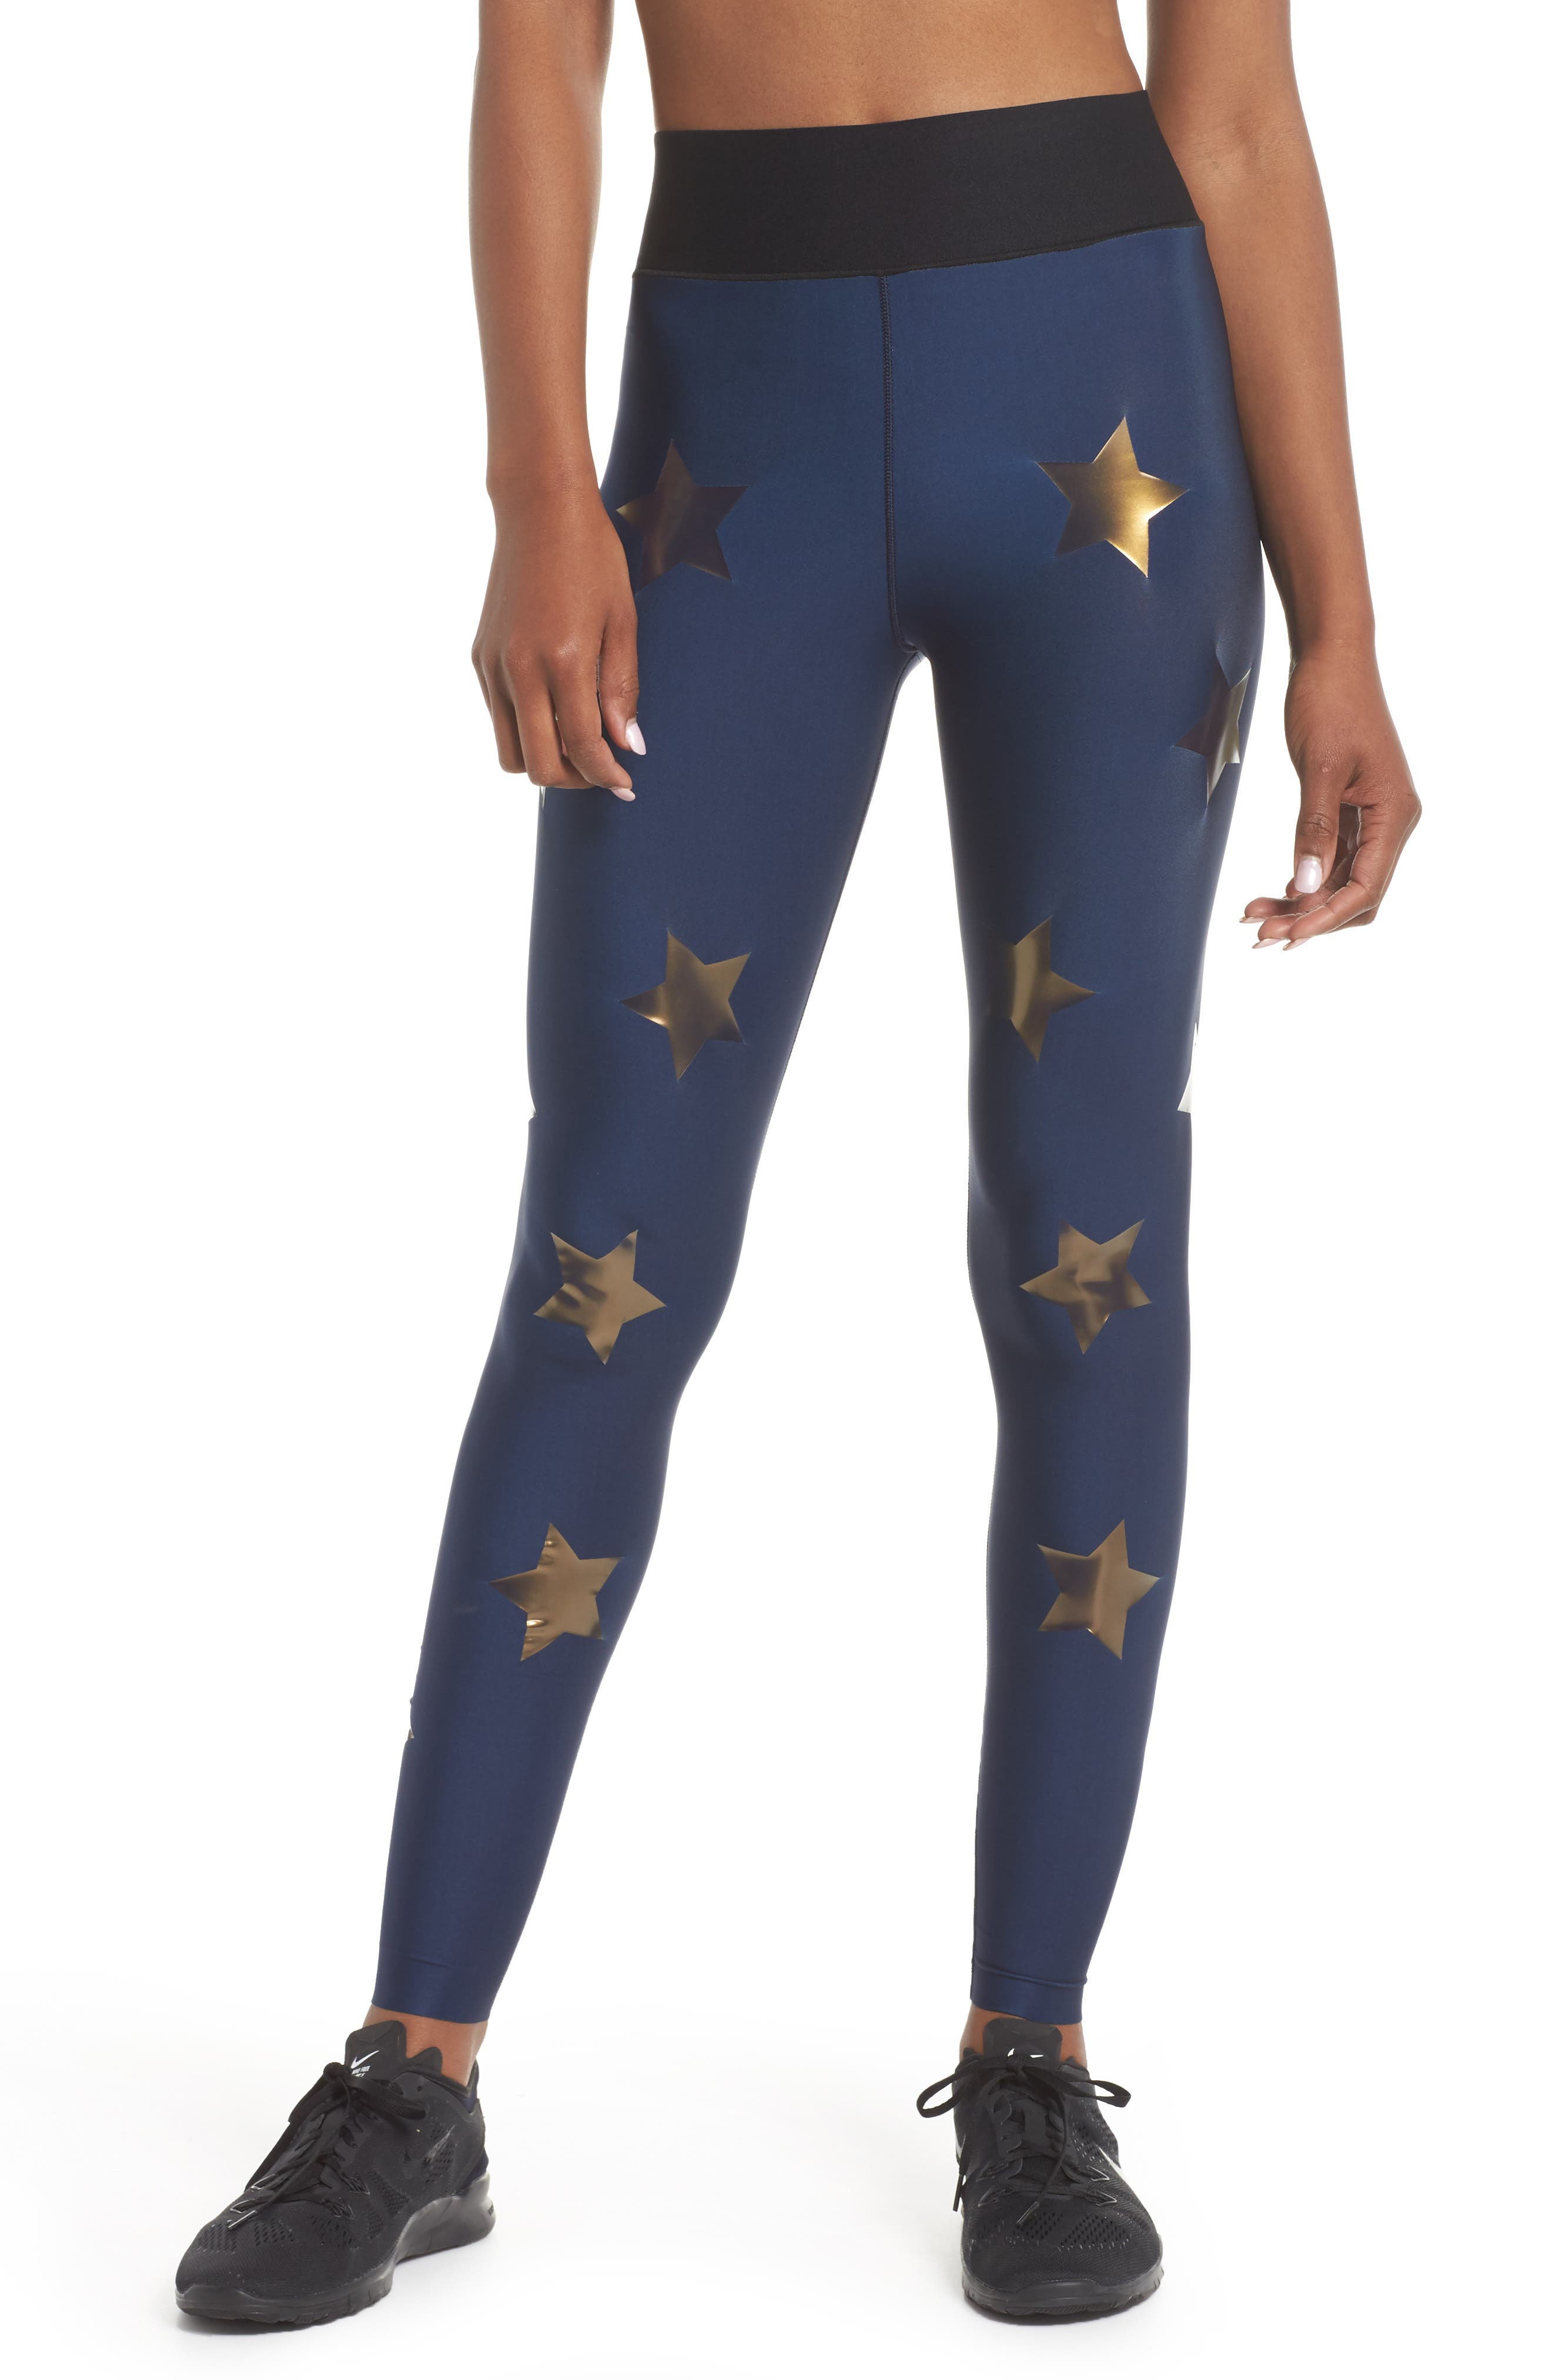 Lux Knockout Leggings,                         Main,                         color, Obig - Oxford Blue Gold